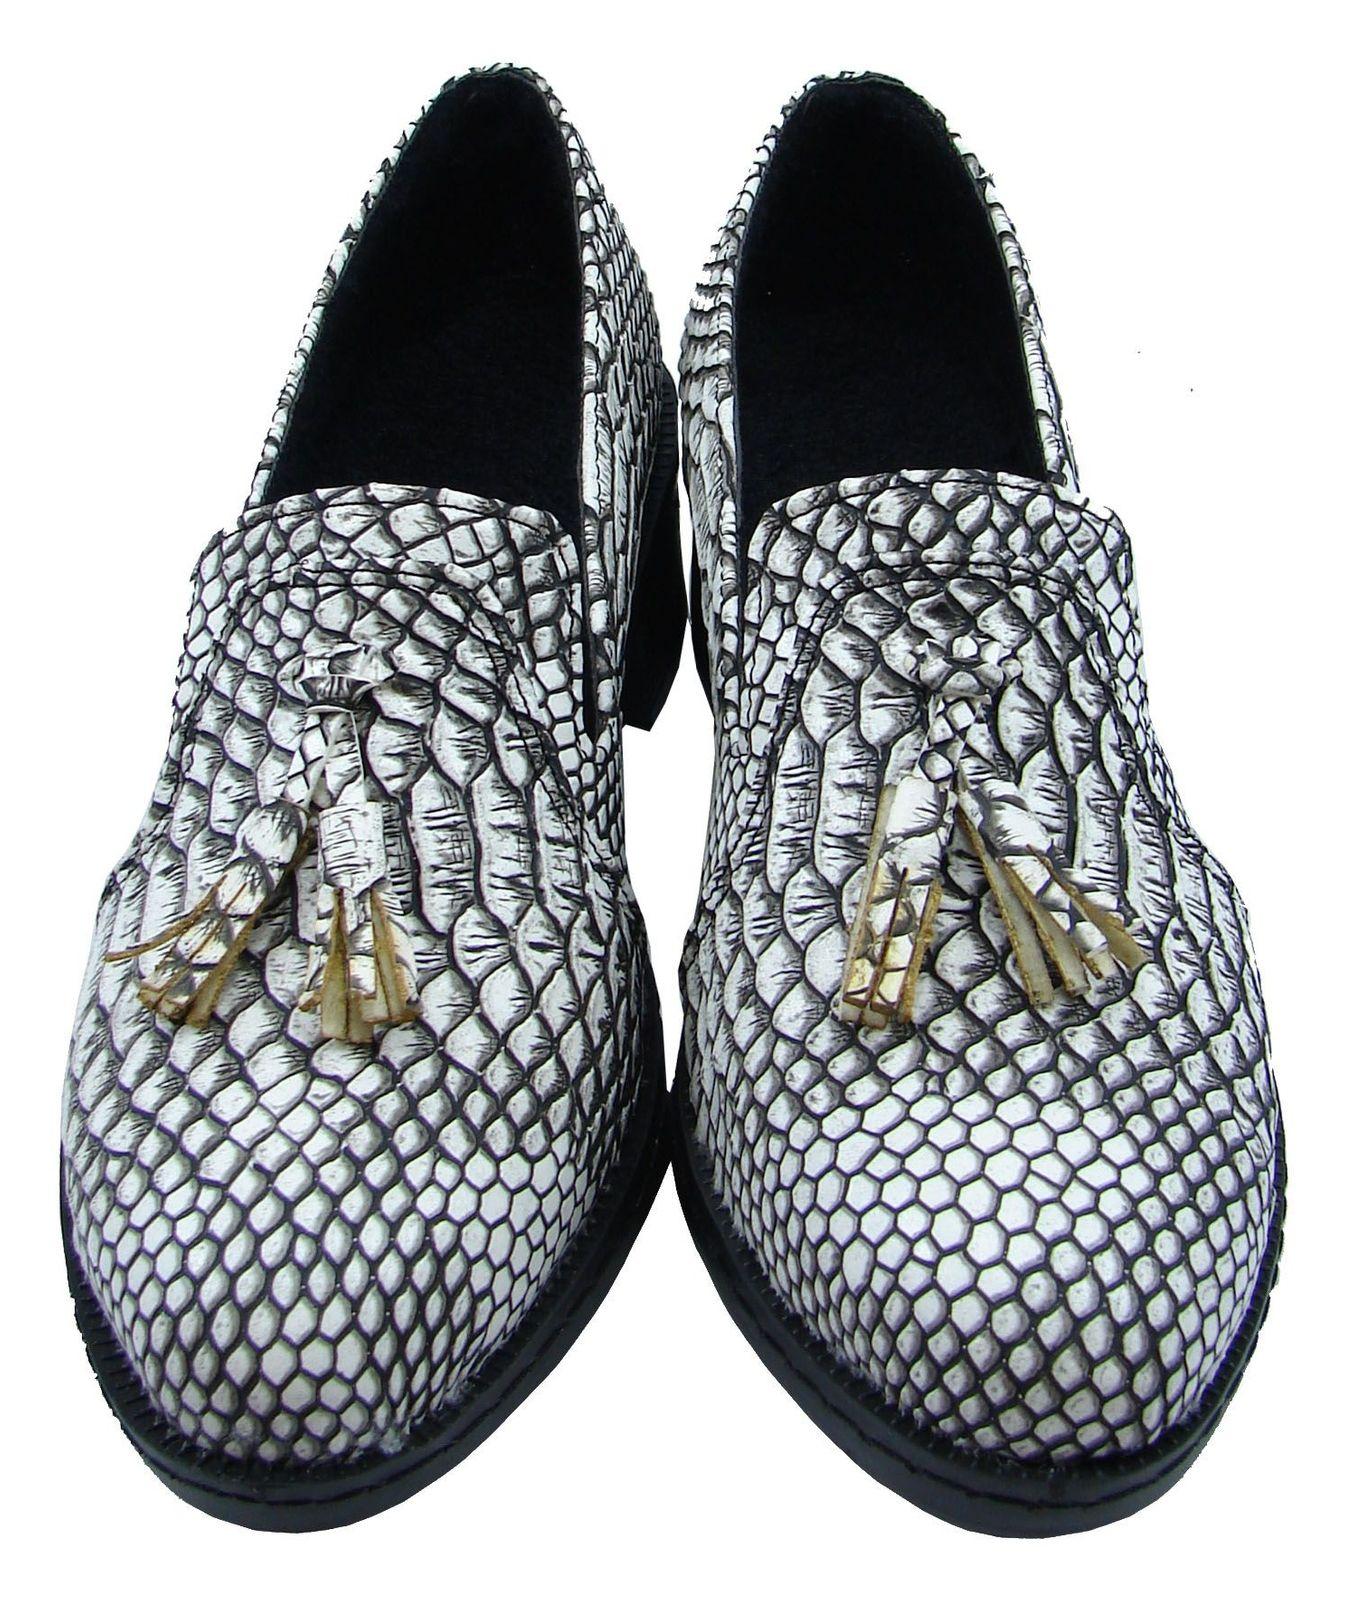 کفش زنانه کد 0024 main 1 2